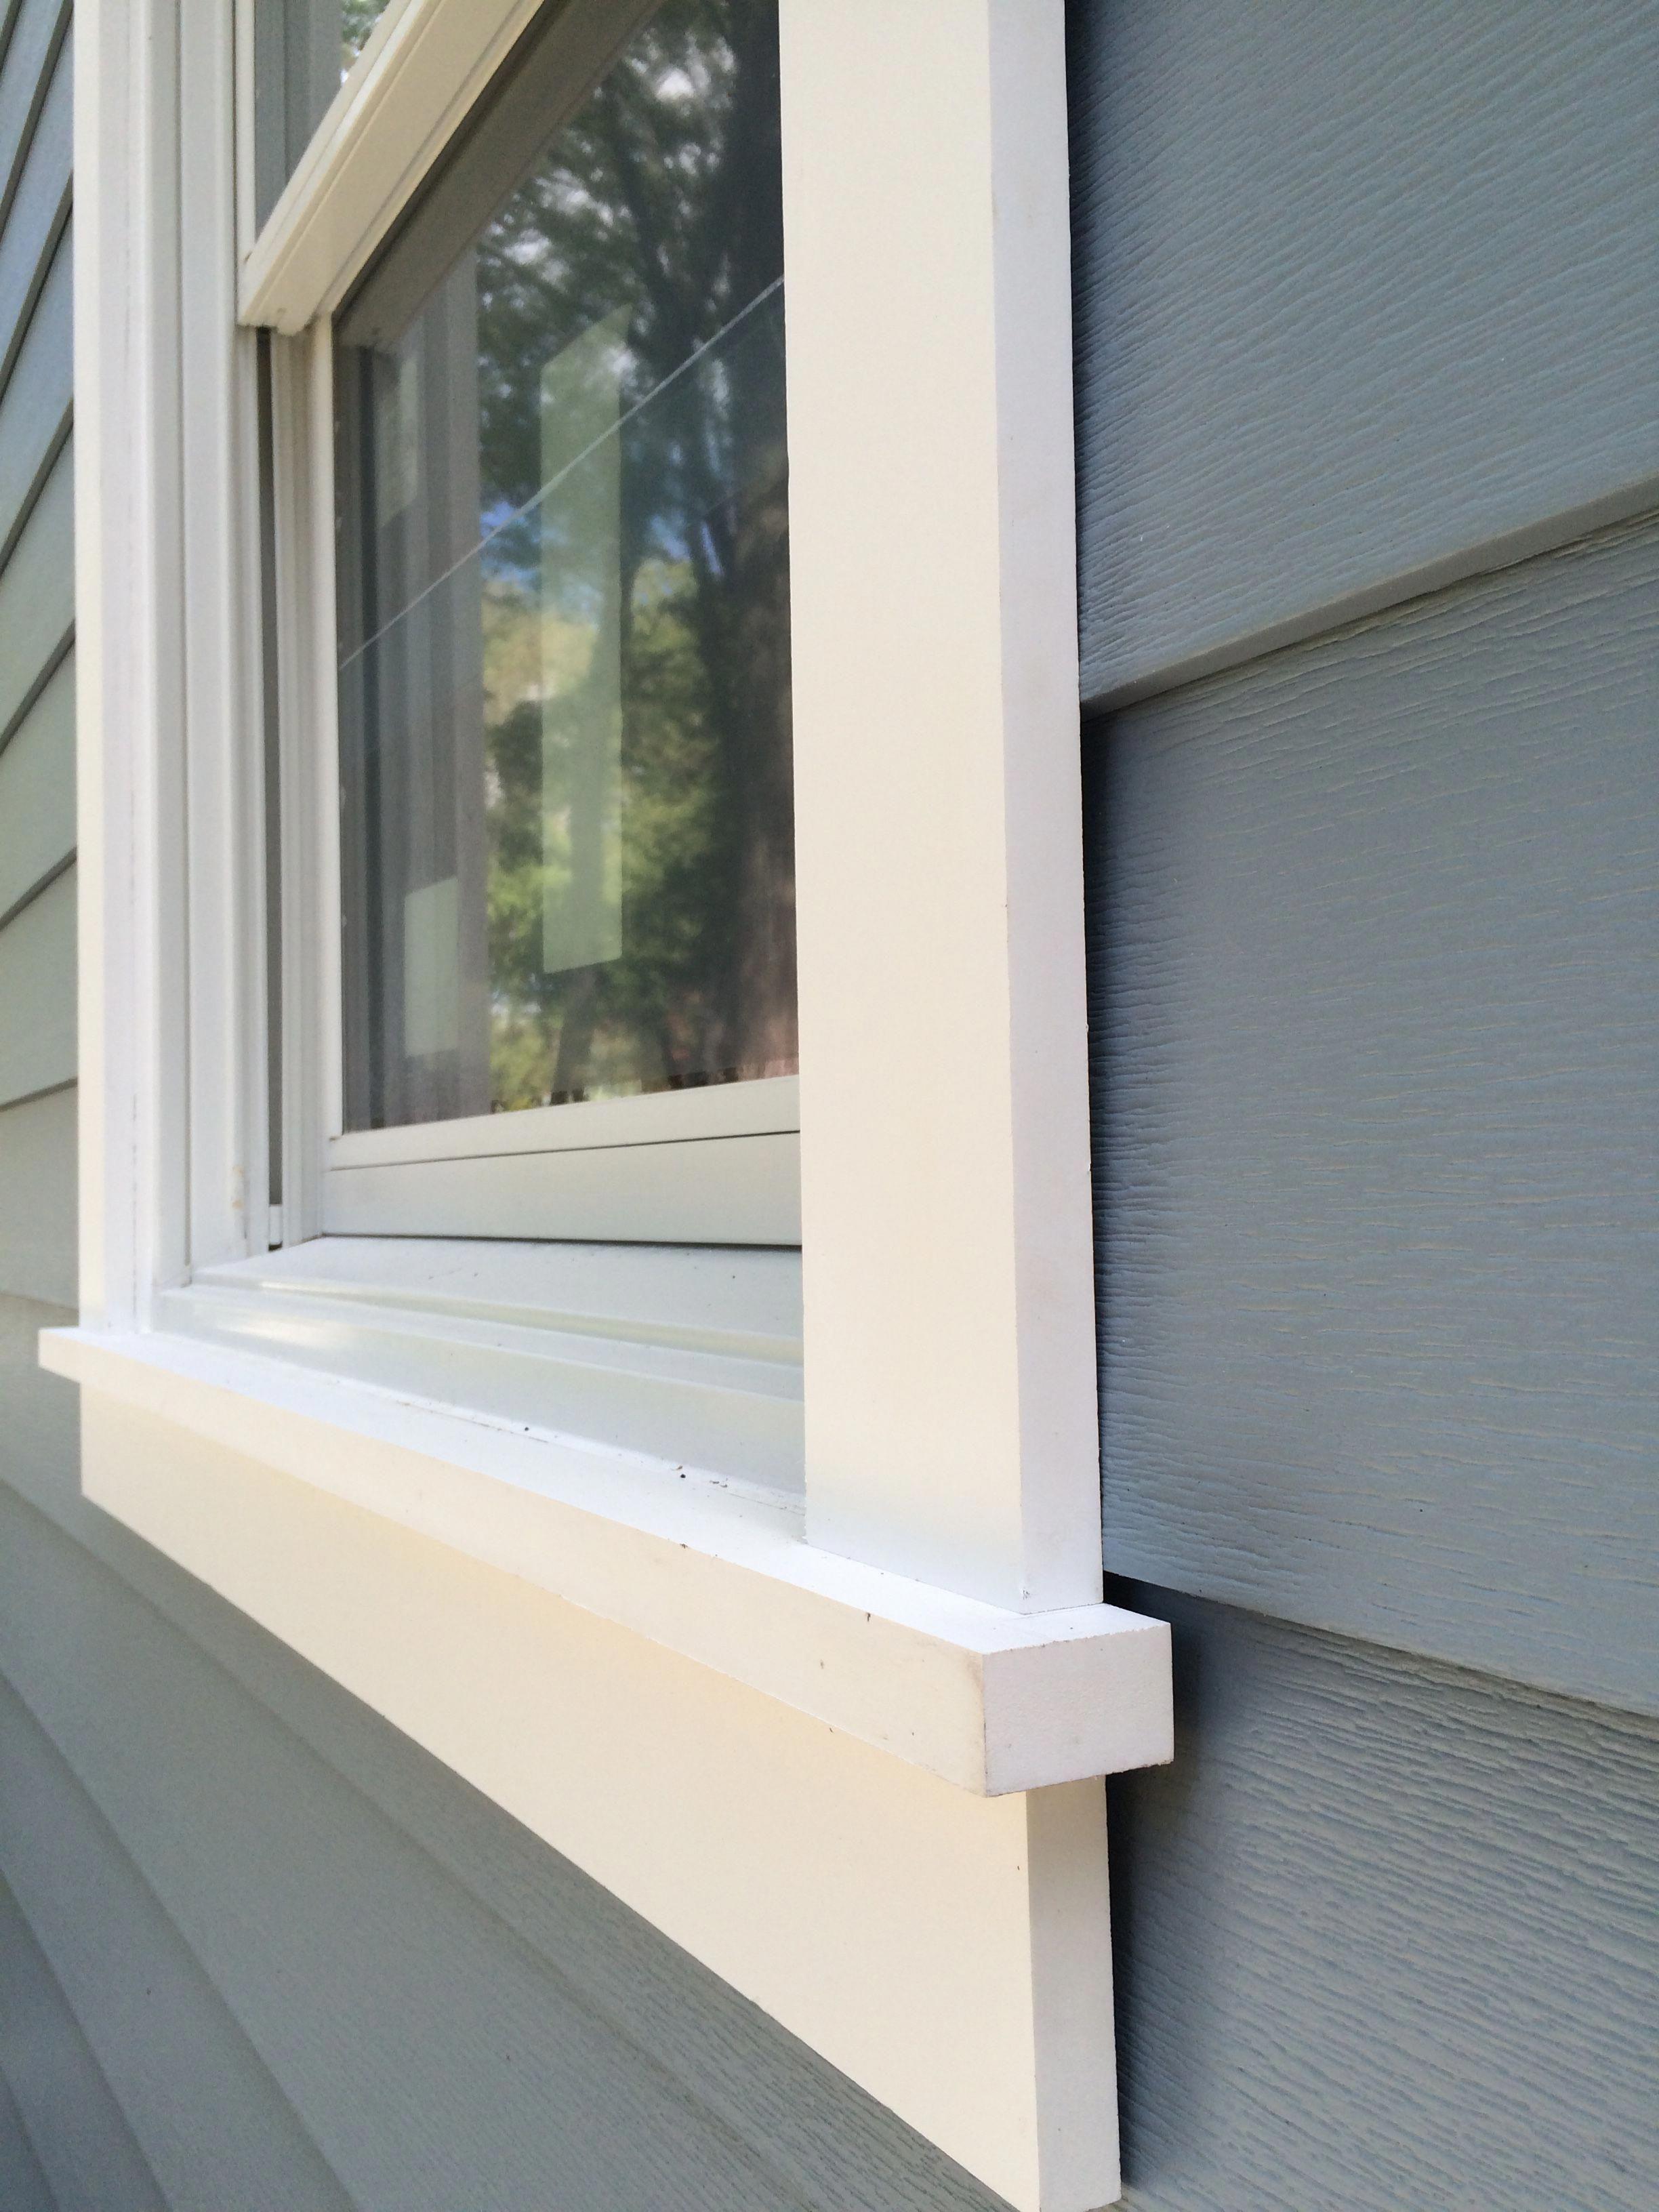 M interior design affordableinteriordesignersnearme - Exterior window trim vinyl siding ...